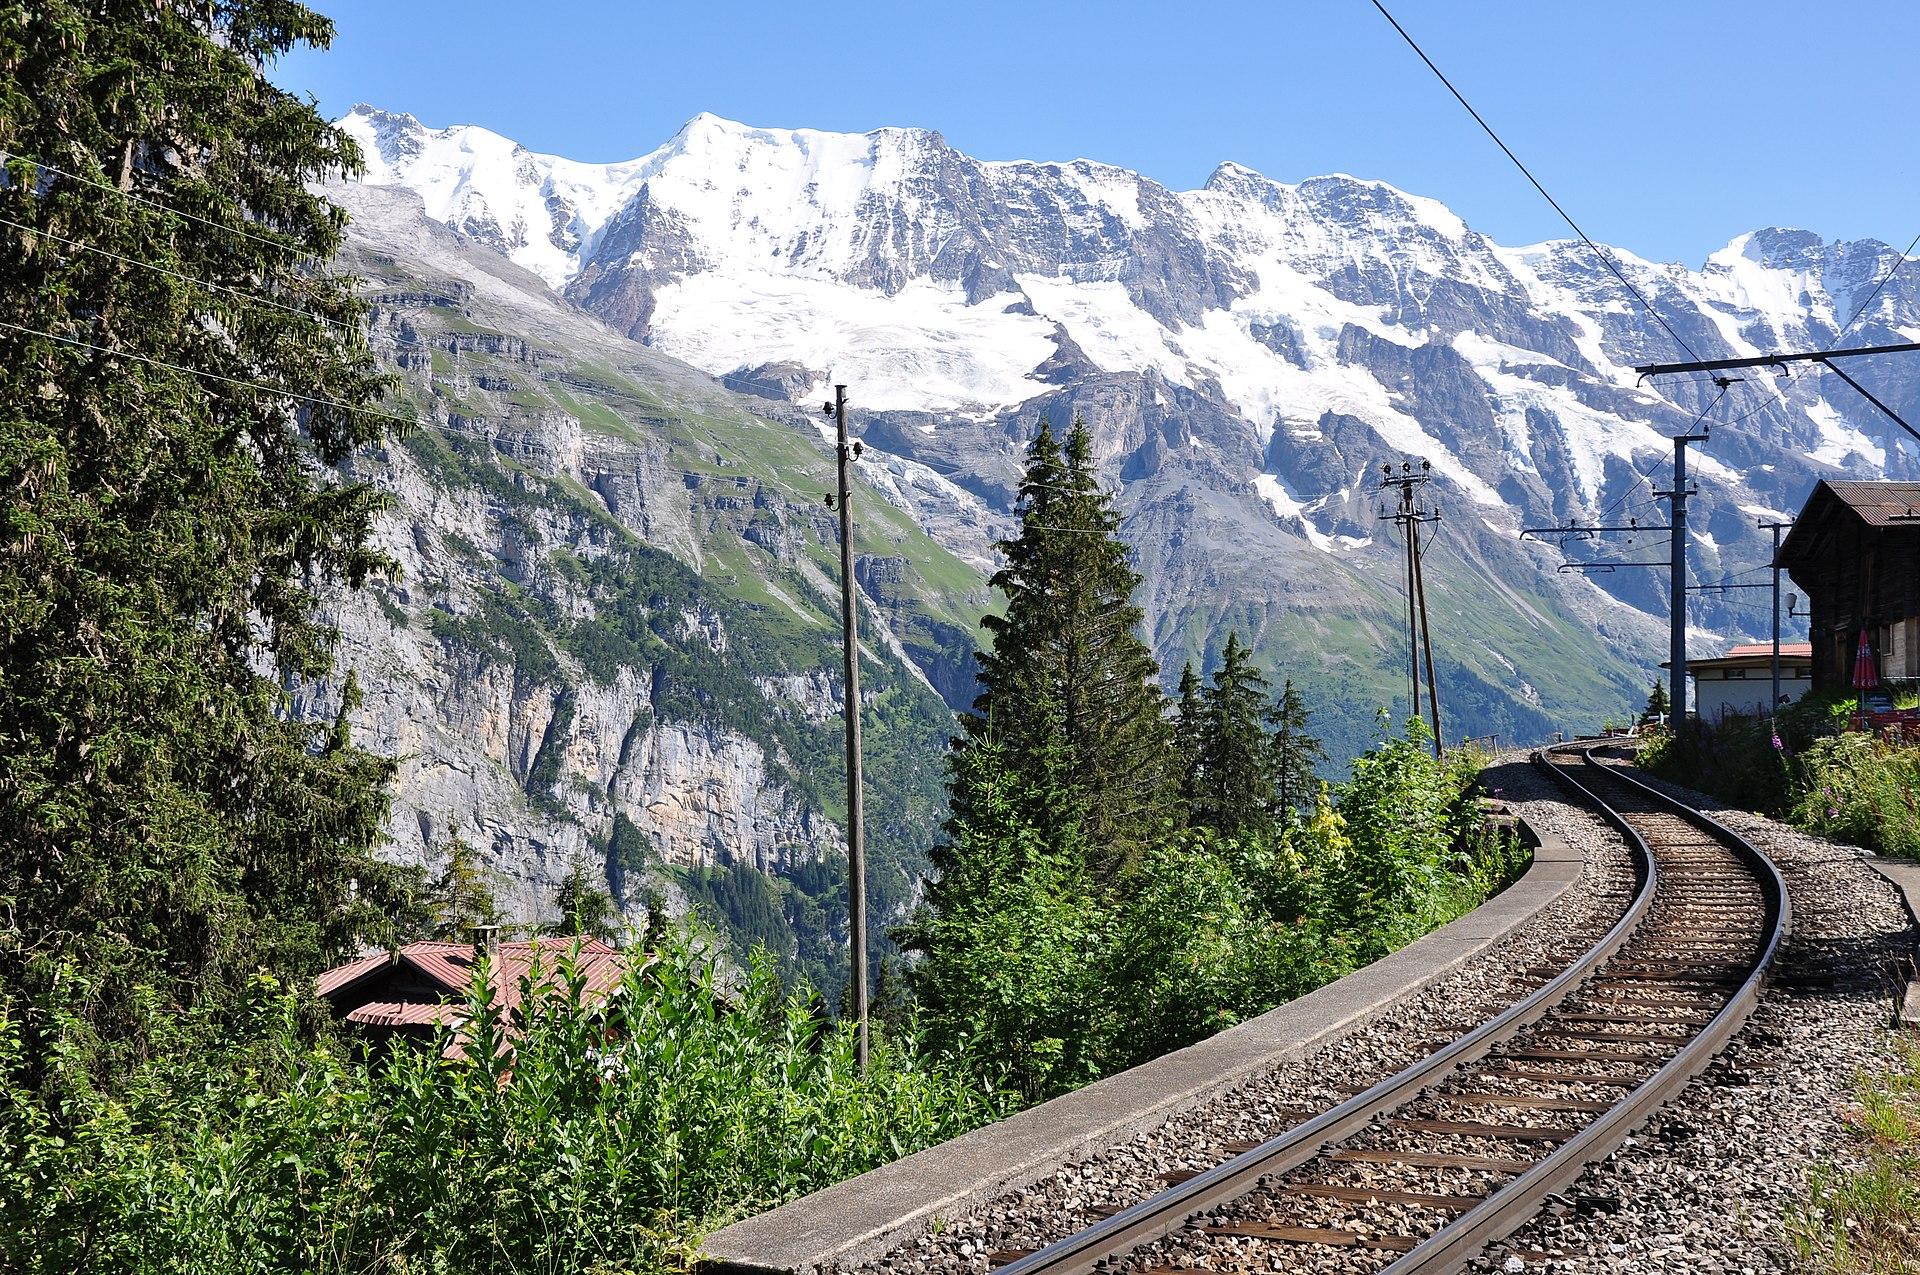 Lauterbrunnen U2013m U00fcrren Mountain Railway